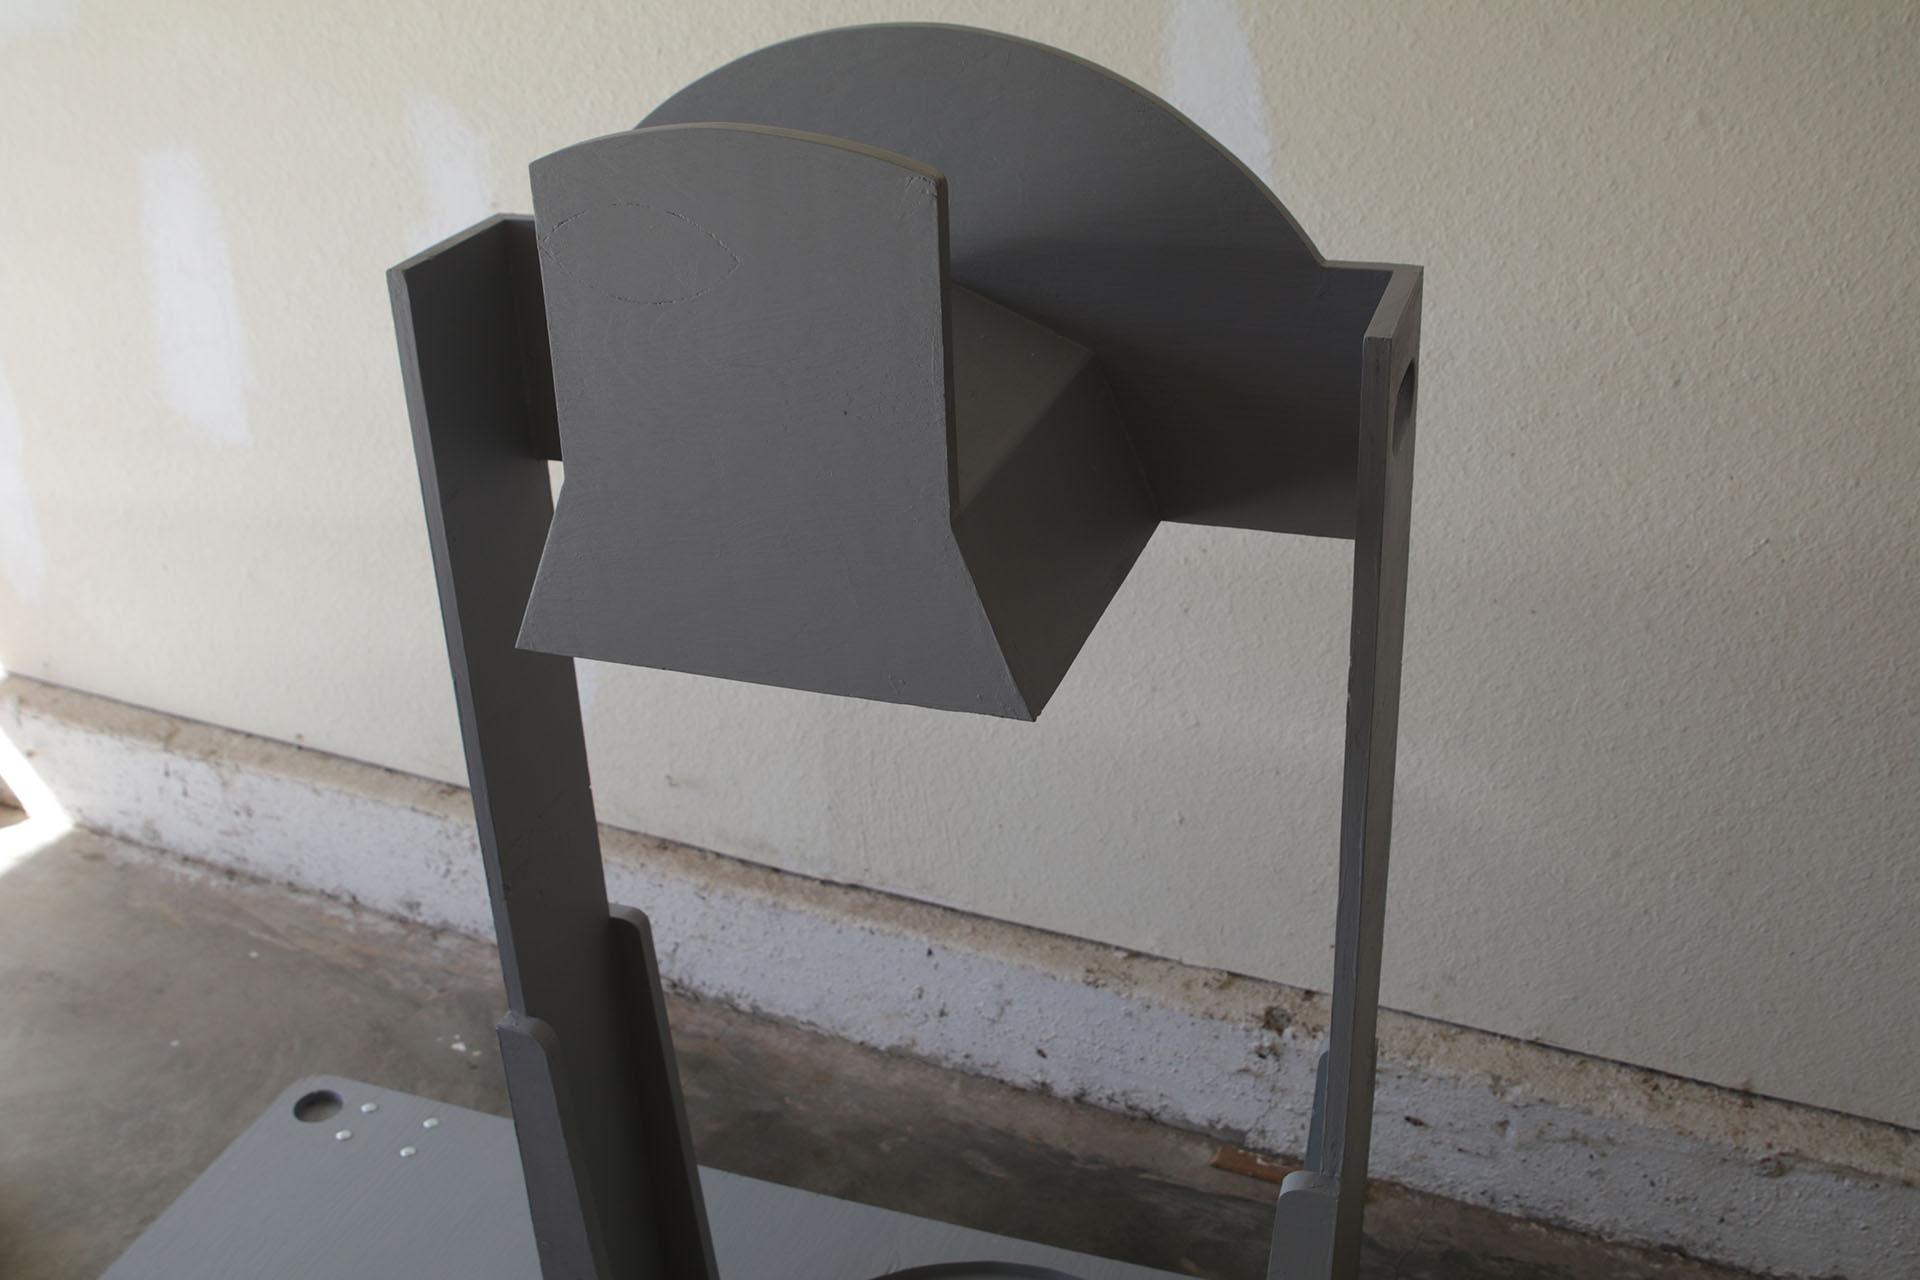 Shop Vac Cart - AstroSteve's Woodworking